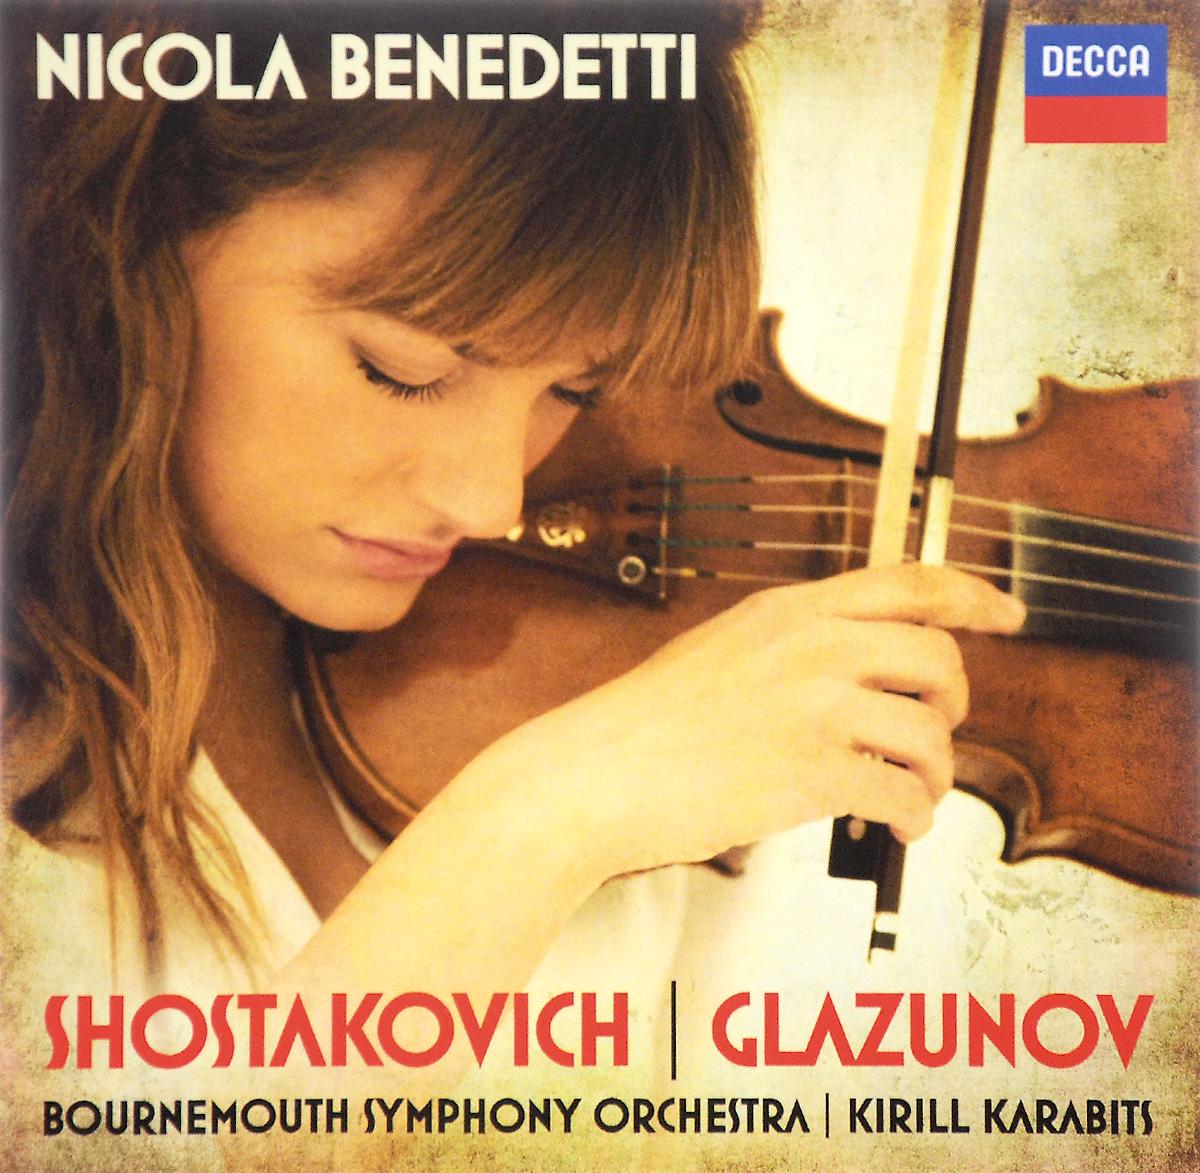 Shostakovich / Glazunov / Nicola Benedetti. Violin Concertos